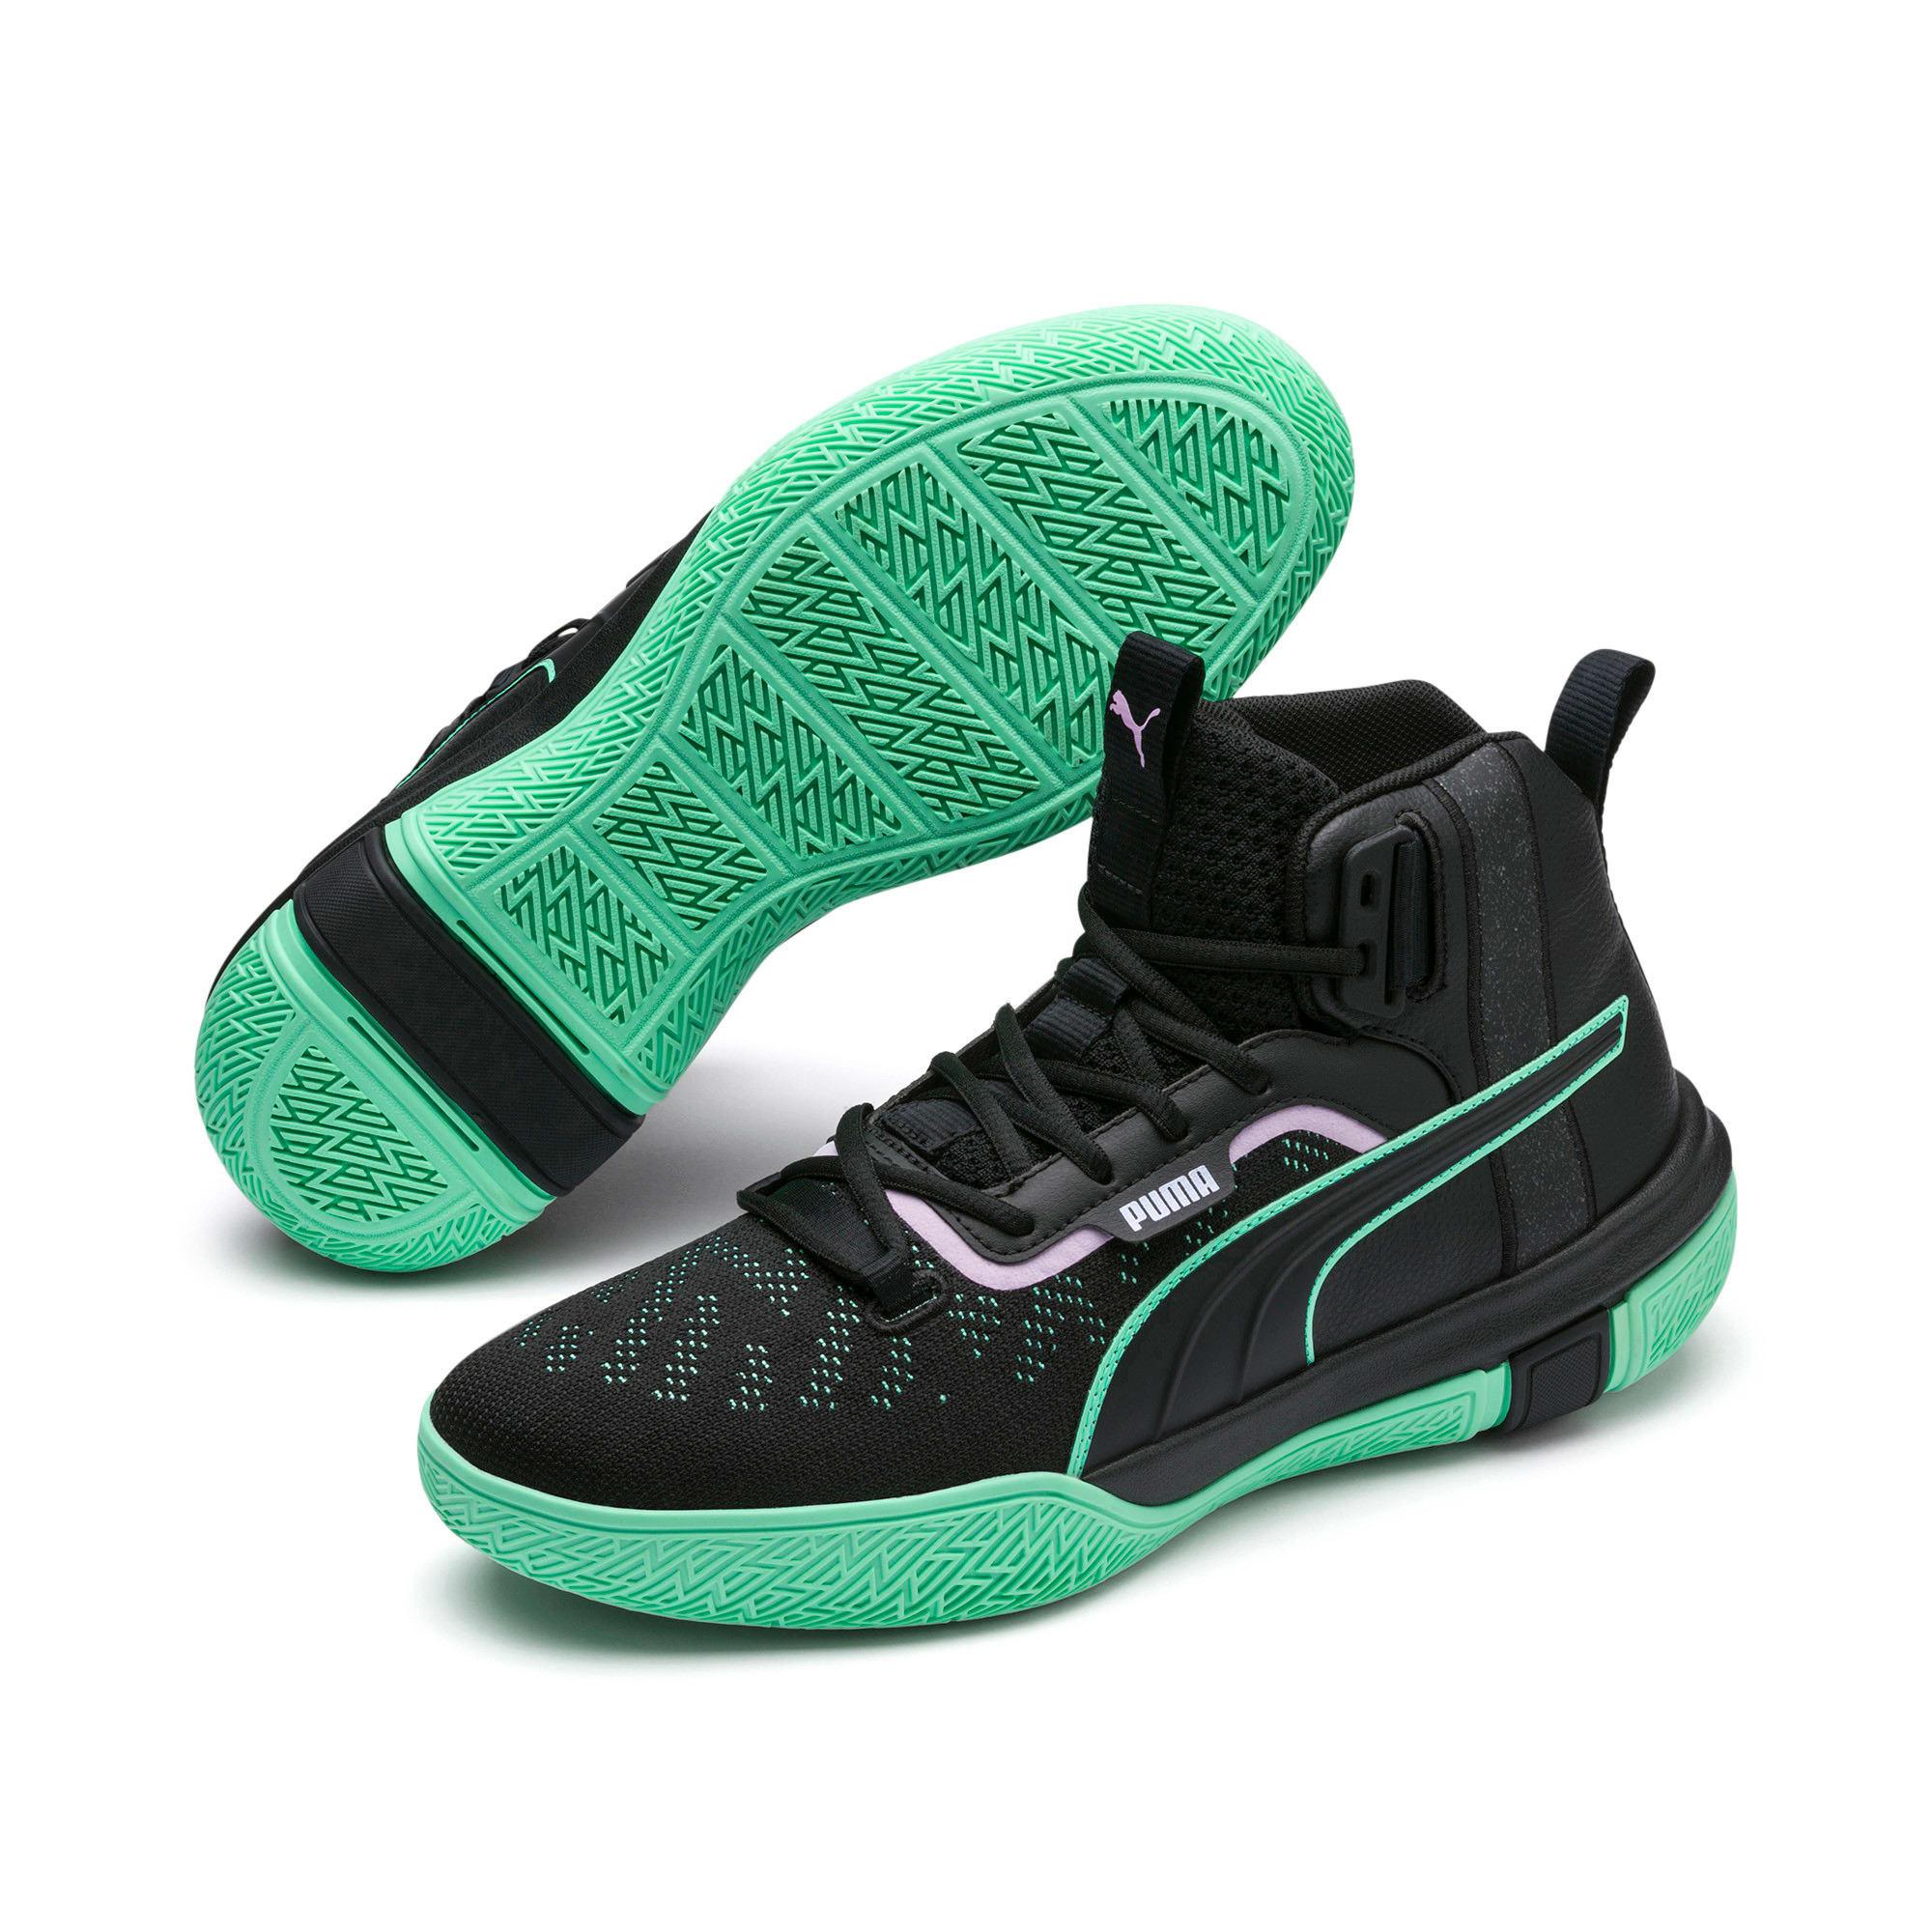 Anteprima 2 di Legacy Dark Mode Basketball Shoes, Puma Black-Orchid Bloom, medio